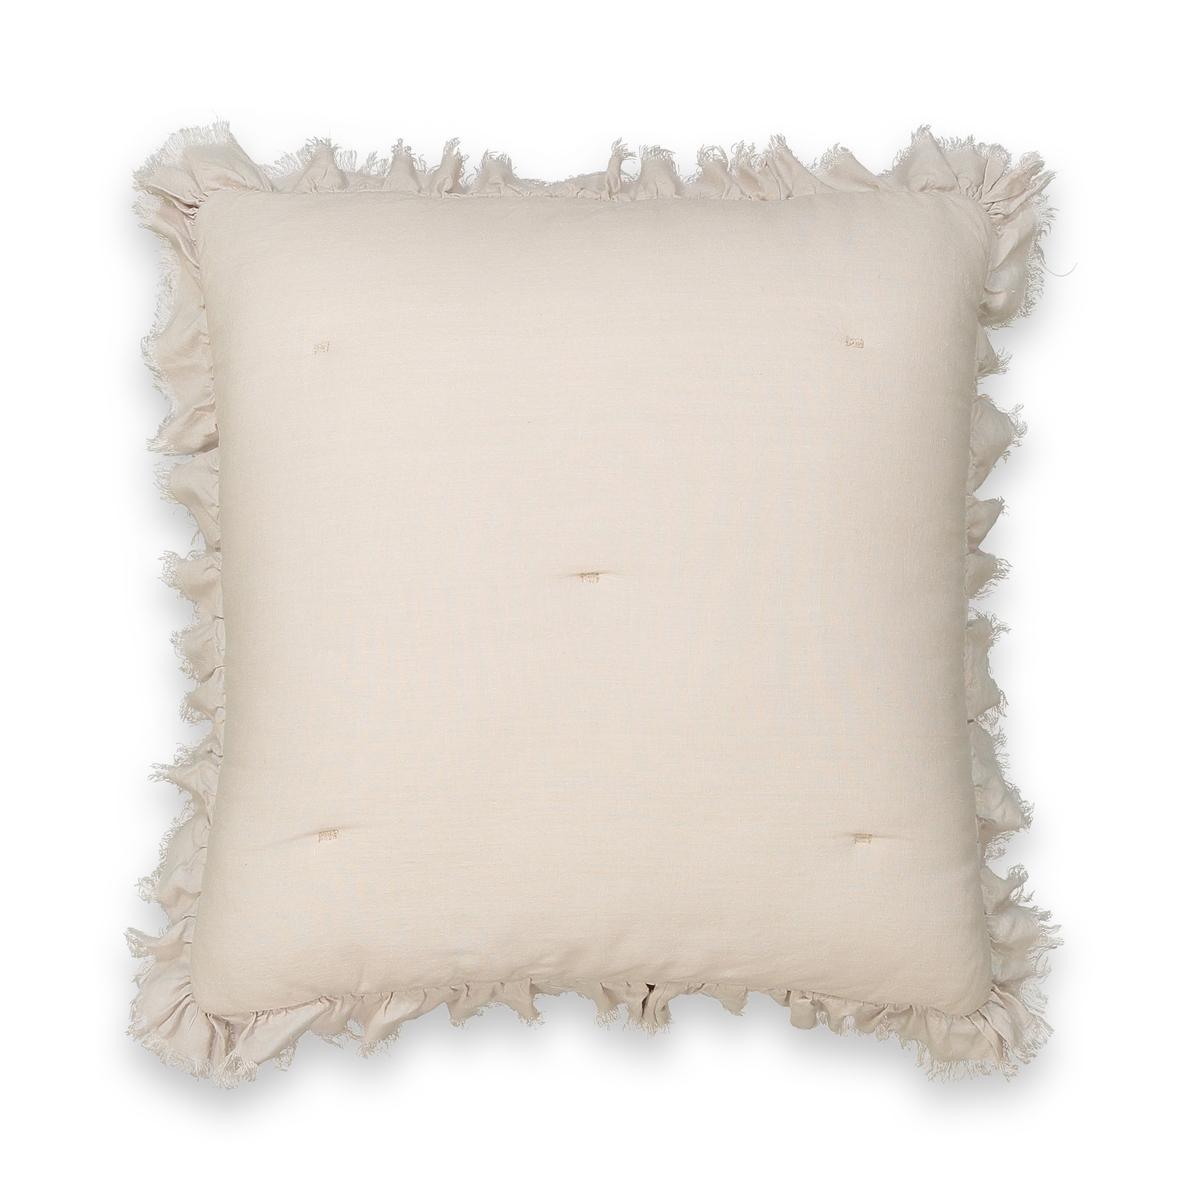 Чехол на подушку-валик из льна и вискозы NILLOW